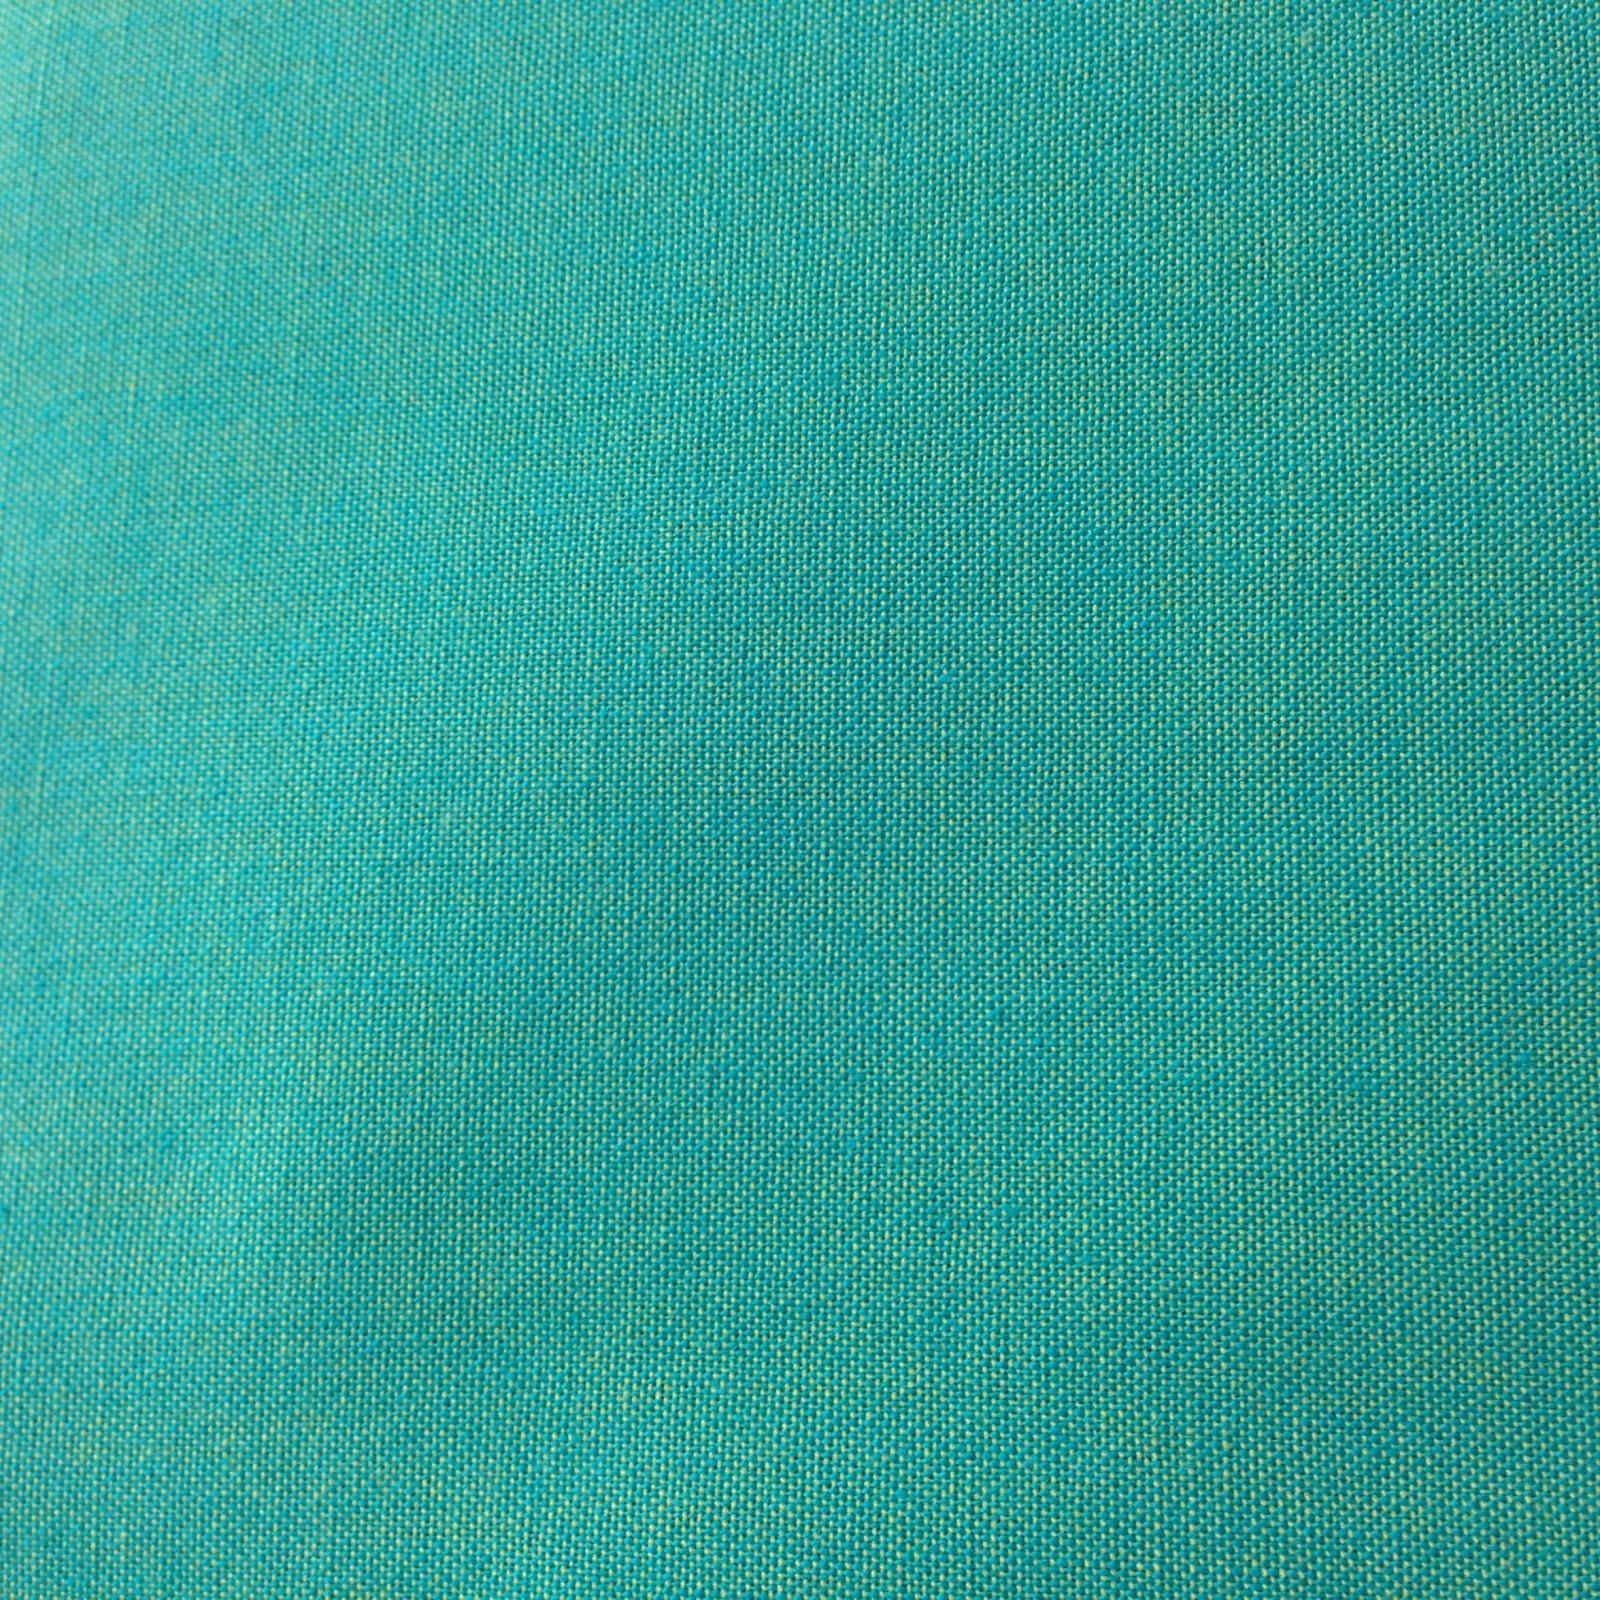 Kokka - Lightweight Canvas - Teal